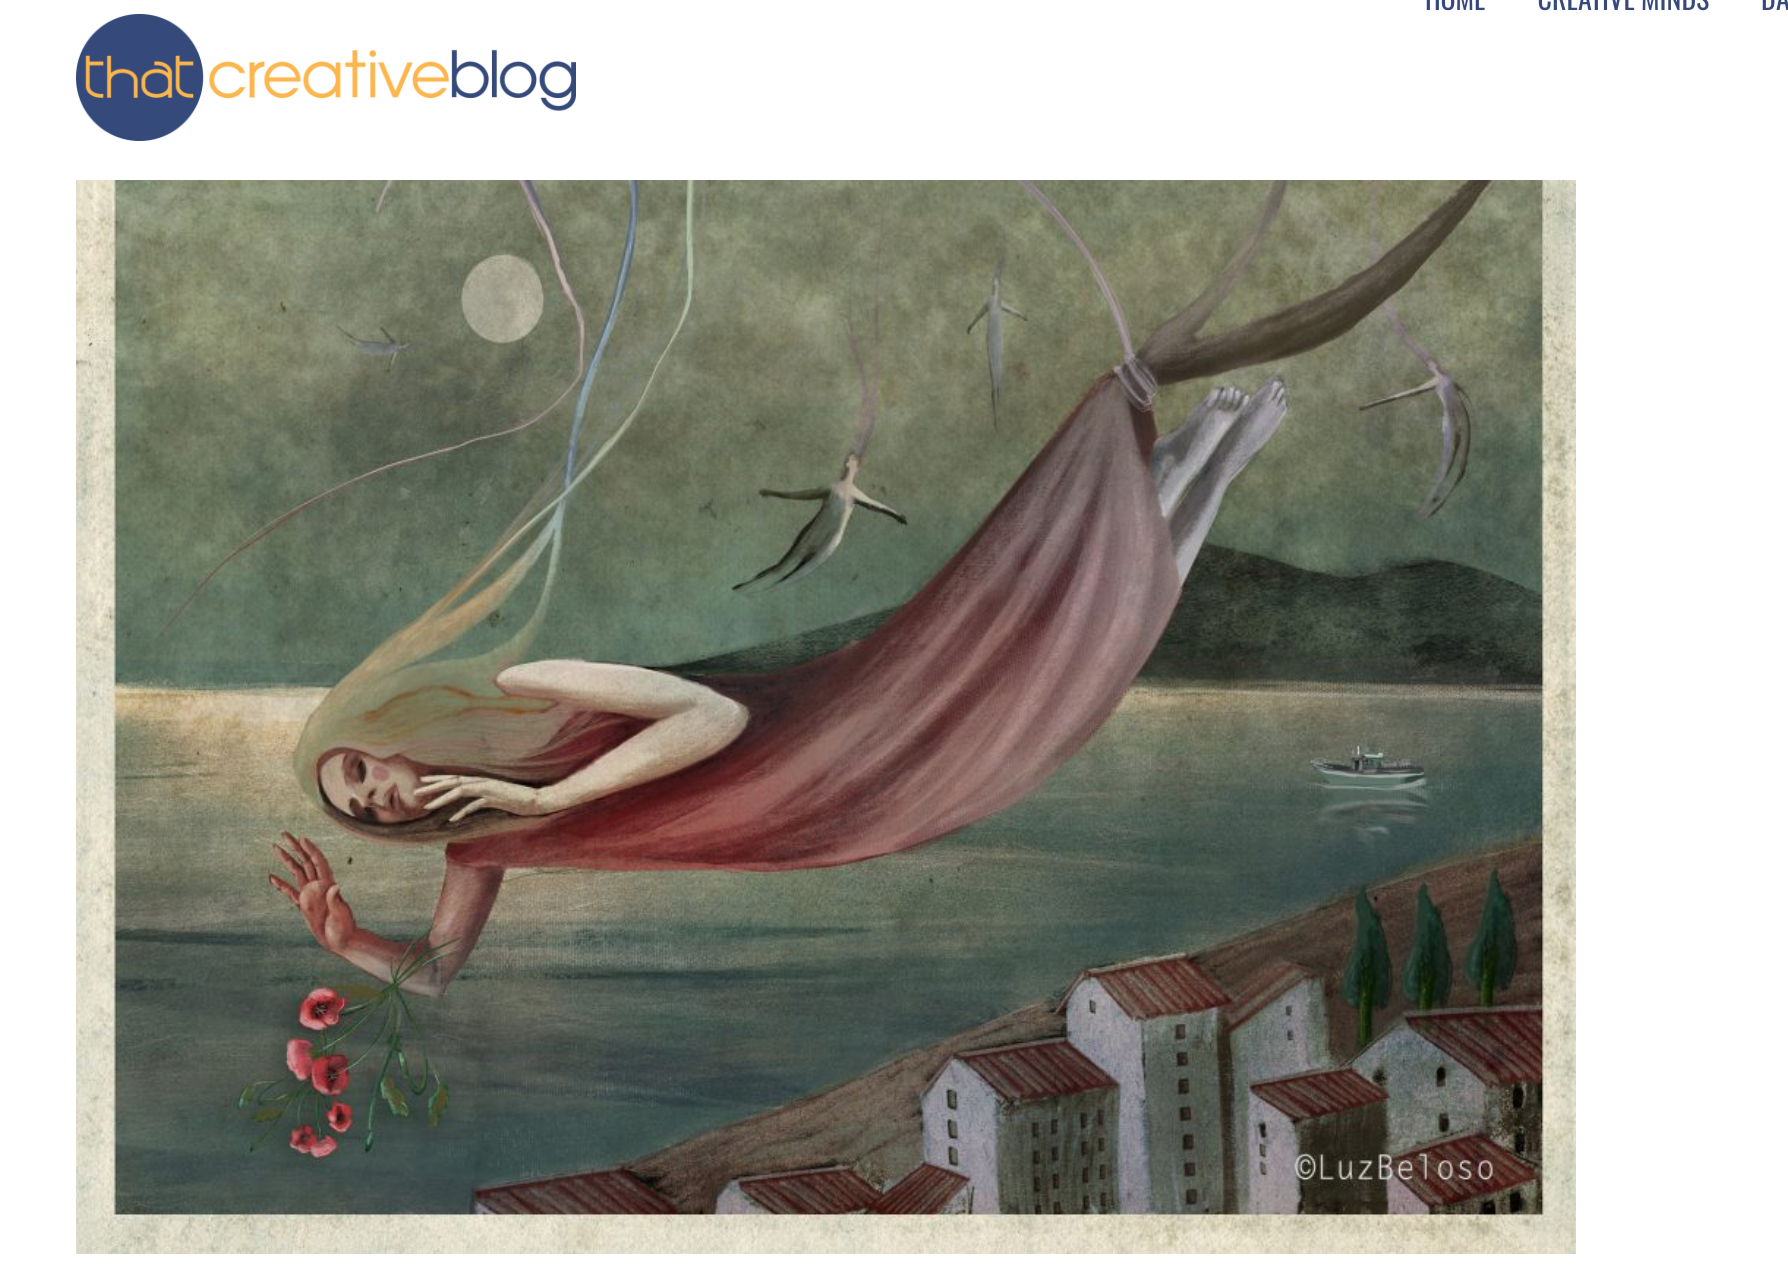 http://thatcreativeblog.com/creative-mind/luz-beloso